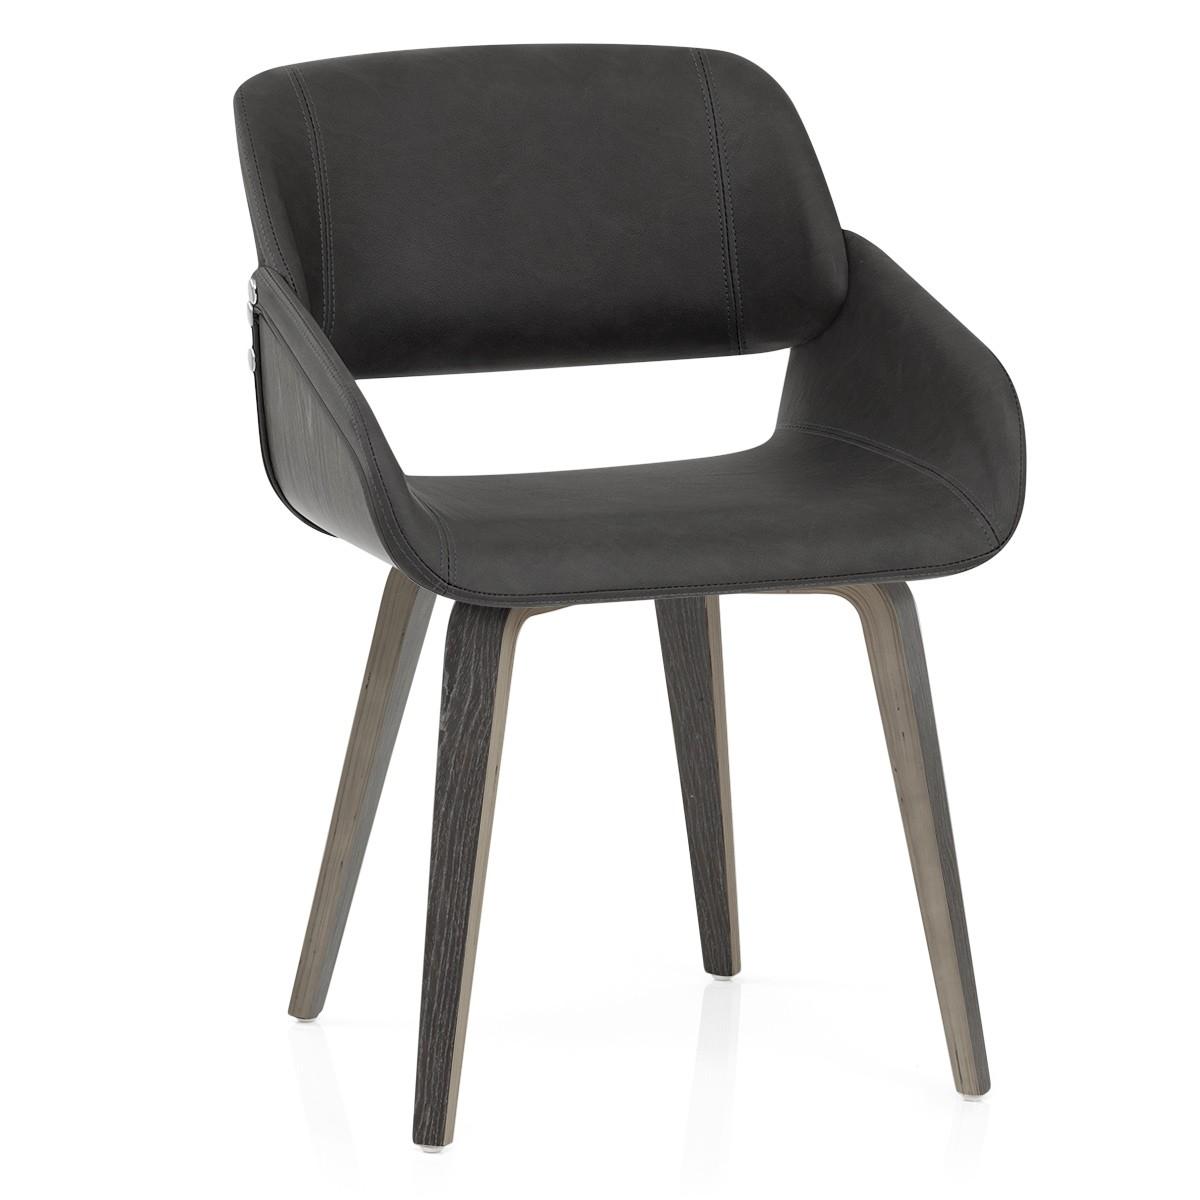 wooden chair. Perfect Wooden Flint Wooden Chair Charcoal Inside